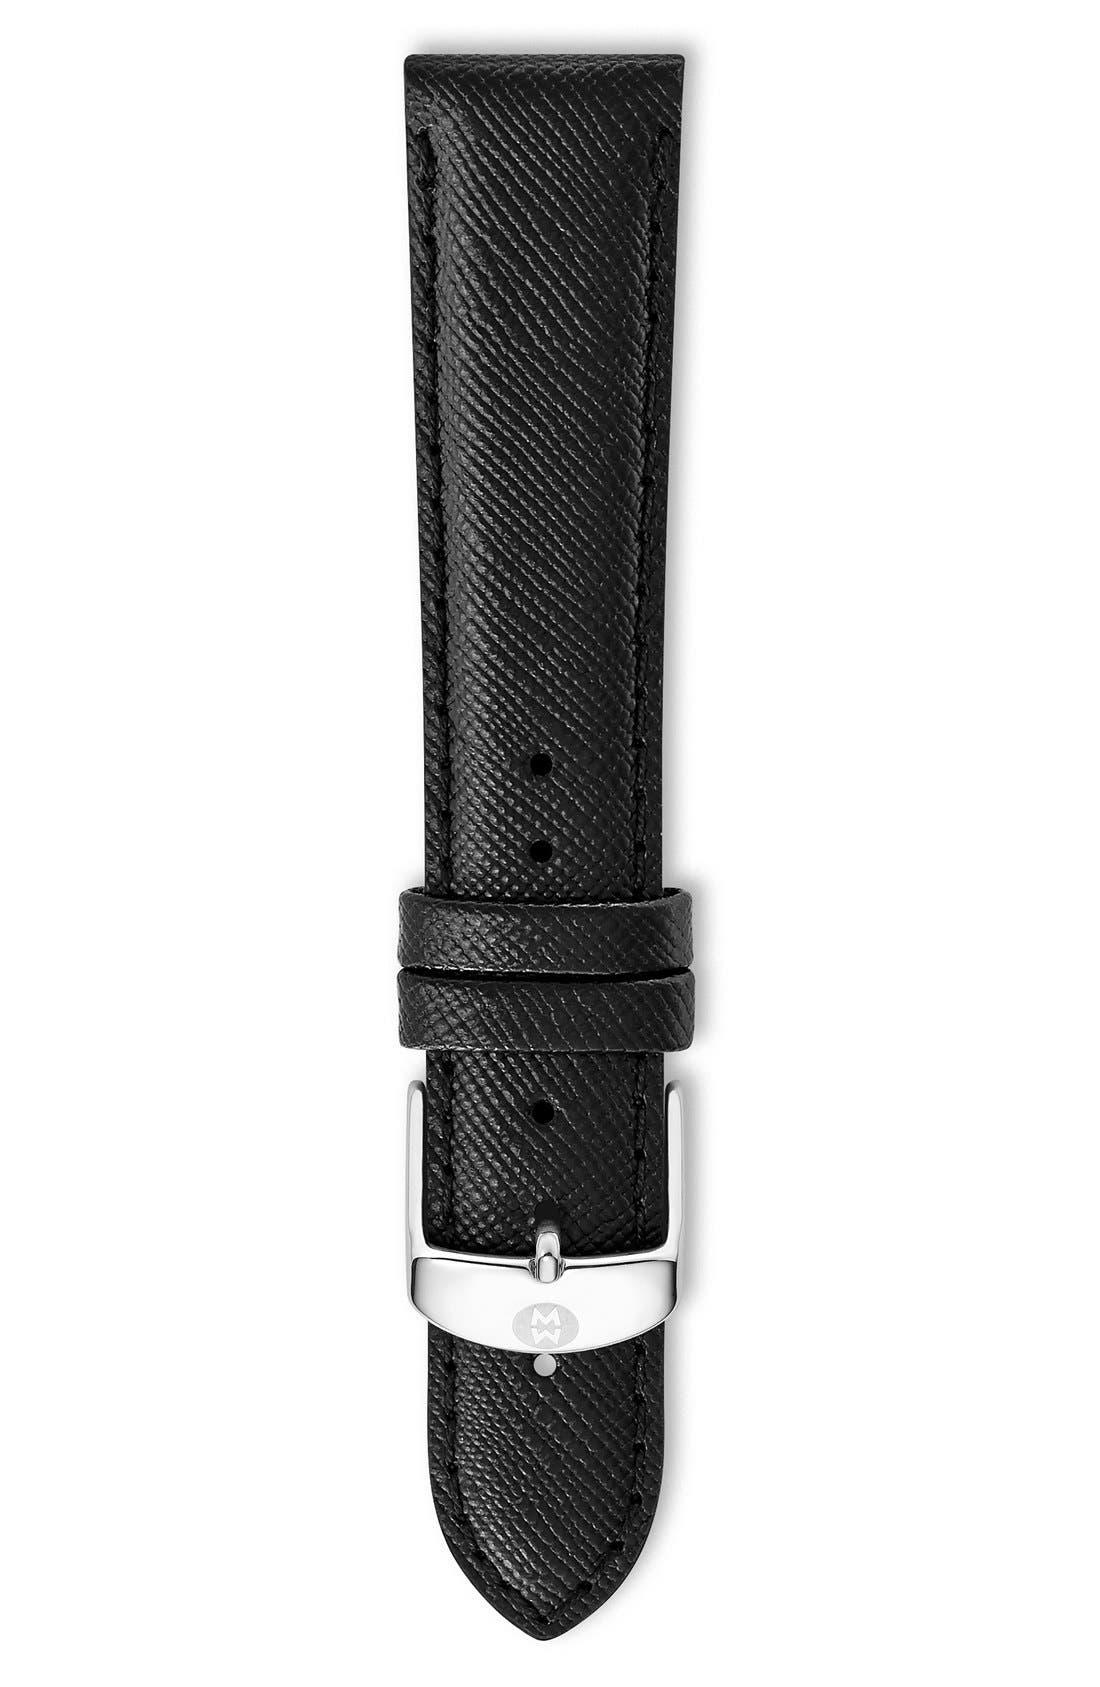 Main Image - MICHELE 16mm Saffiano Leather Watch Strap